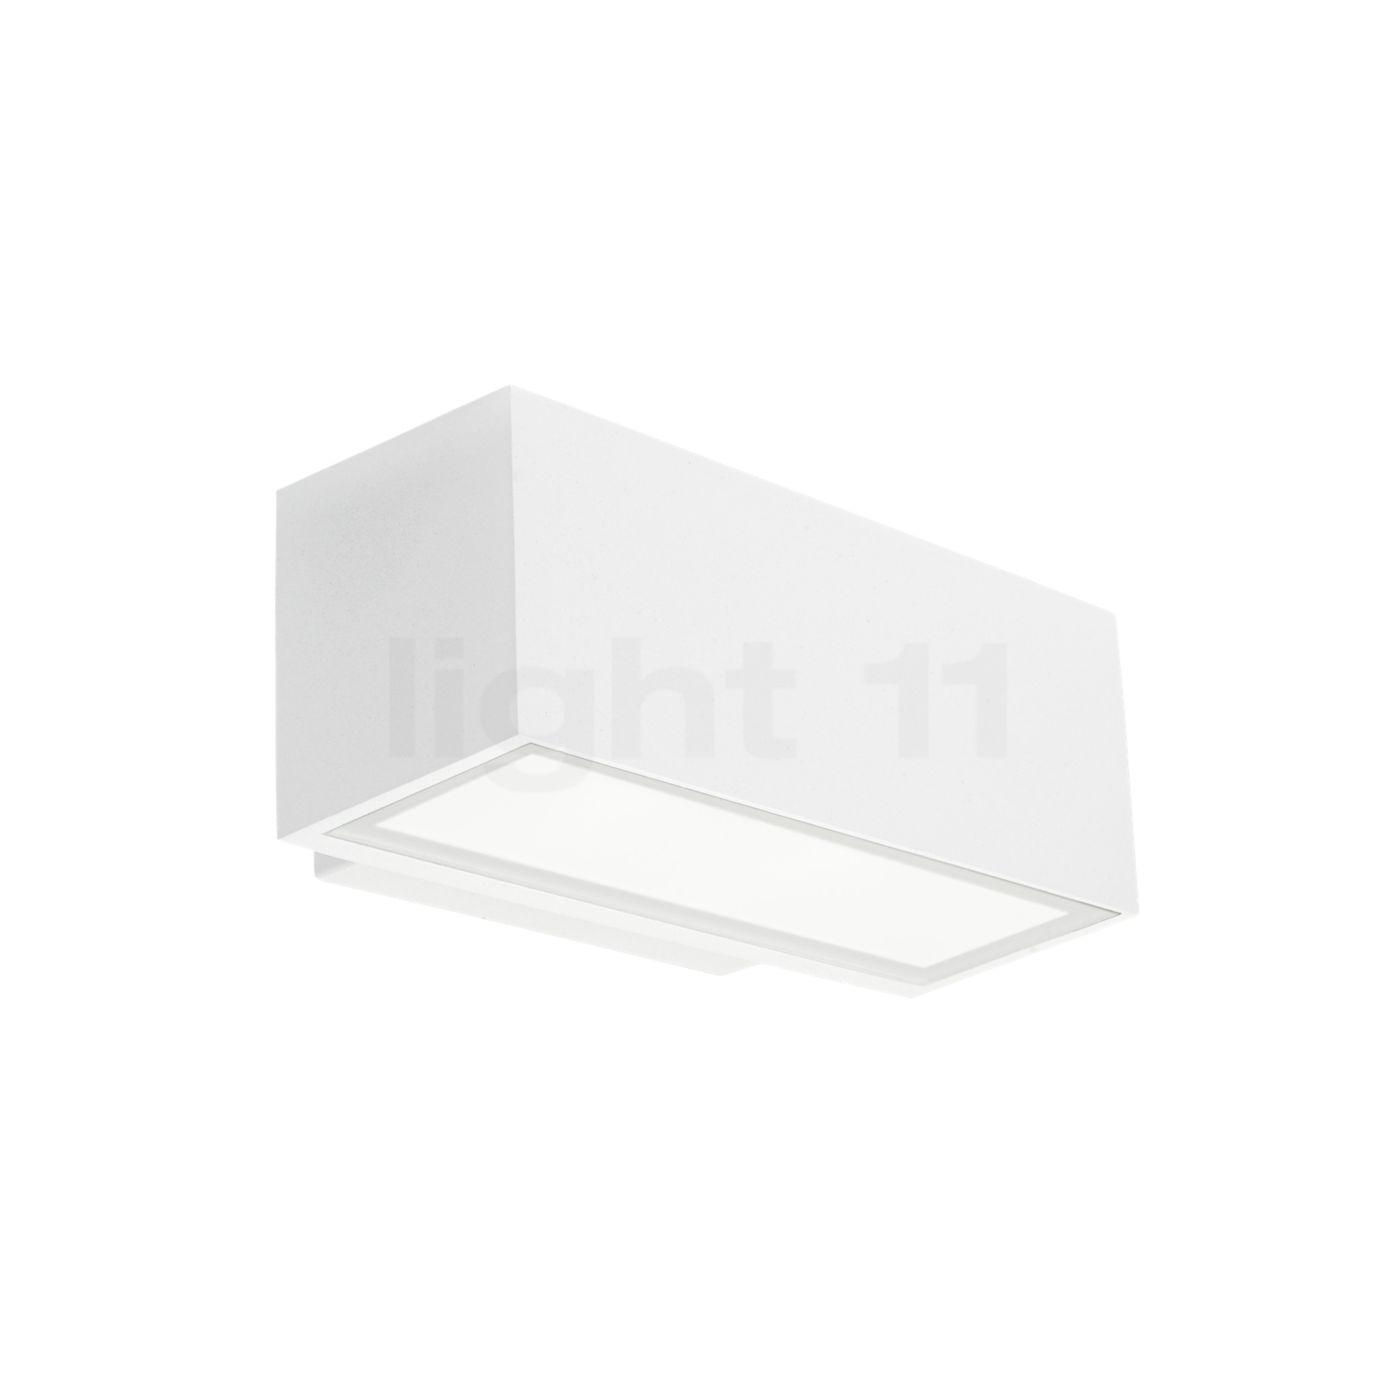 LEDS-C4 Afrodita 11.5W Wandleuchte LED, weiß 05-9912-14-CL